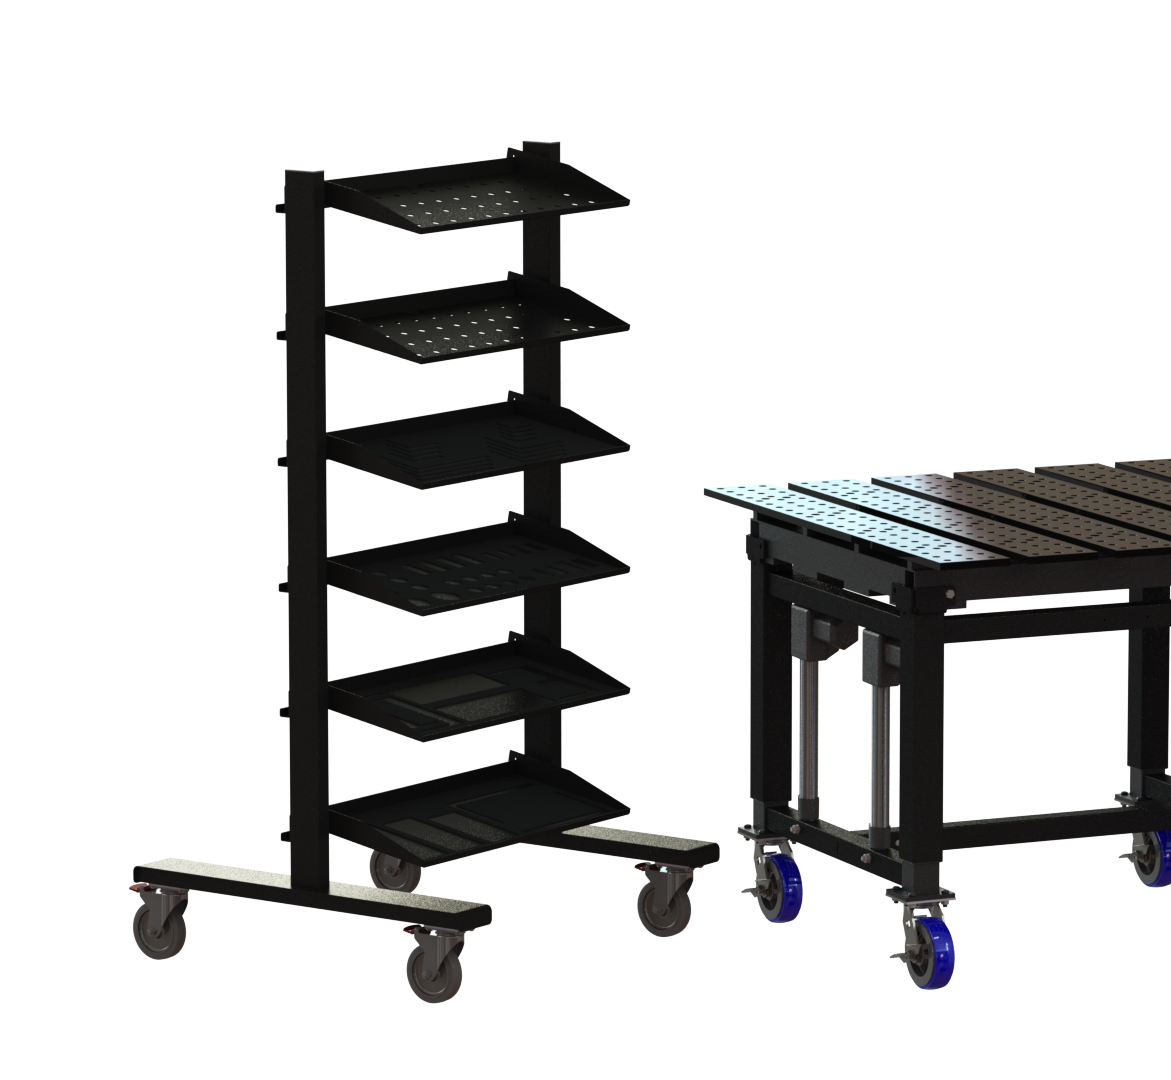 Welding table tool rack